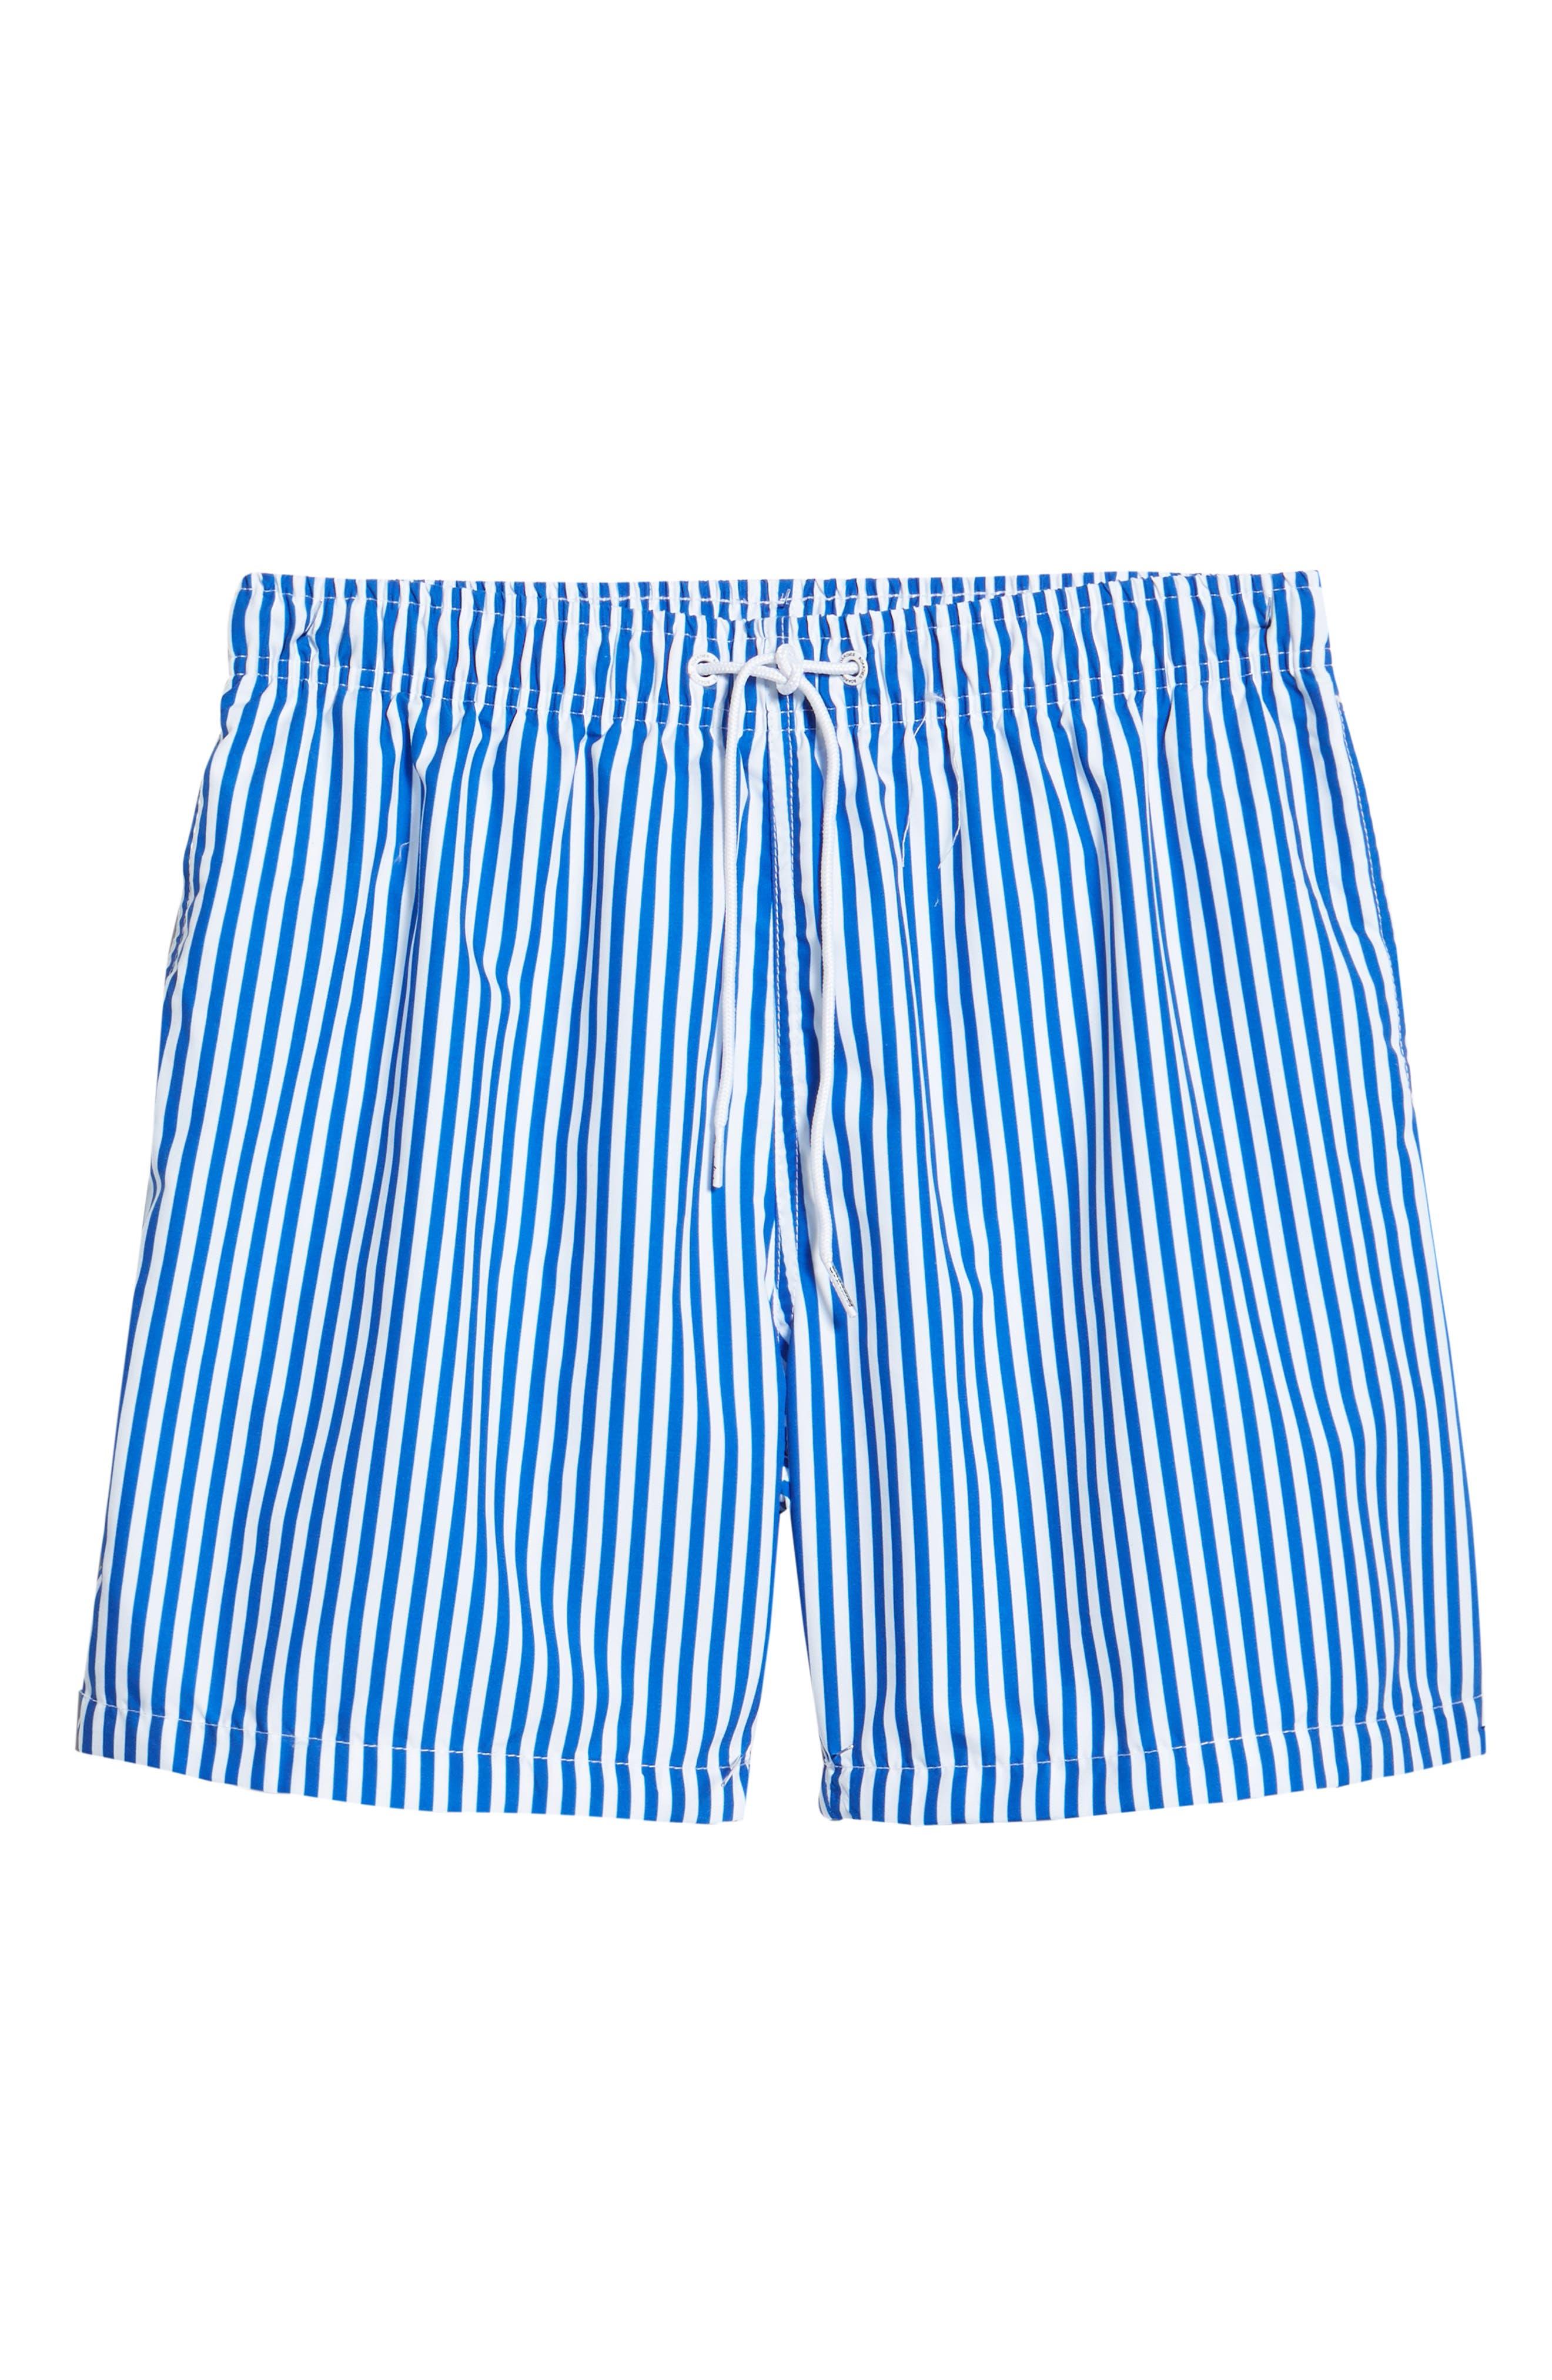 Deck Stripes Swim Trunks,                             Alternate thumbnail 6, color,                             400